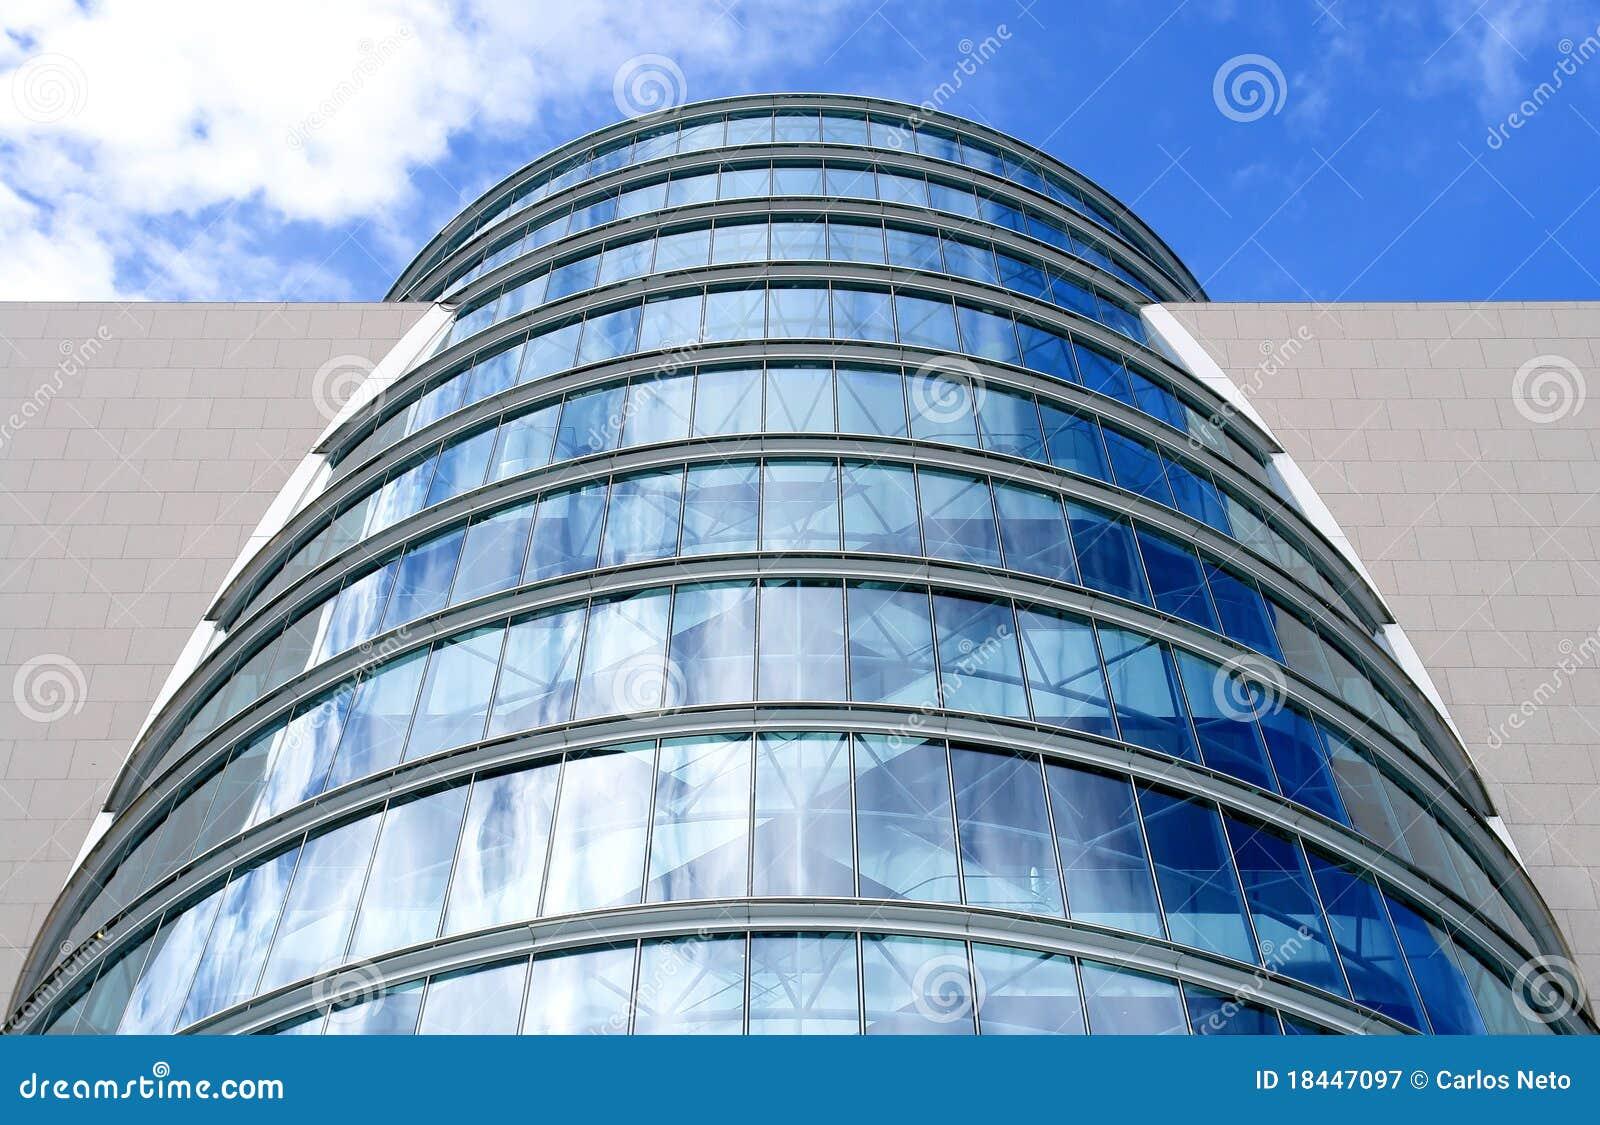 Architettura moderna a dublino immagine stock immagine for L architettura moderna